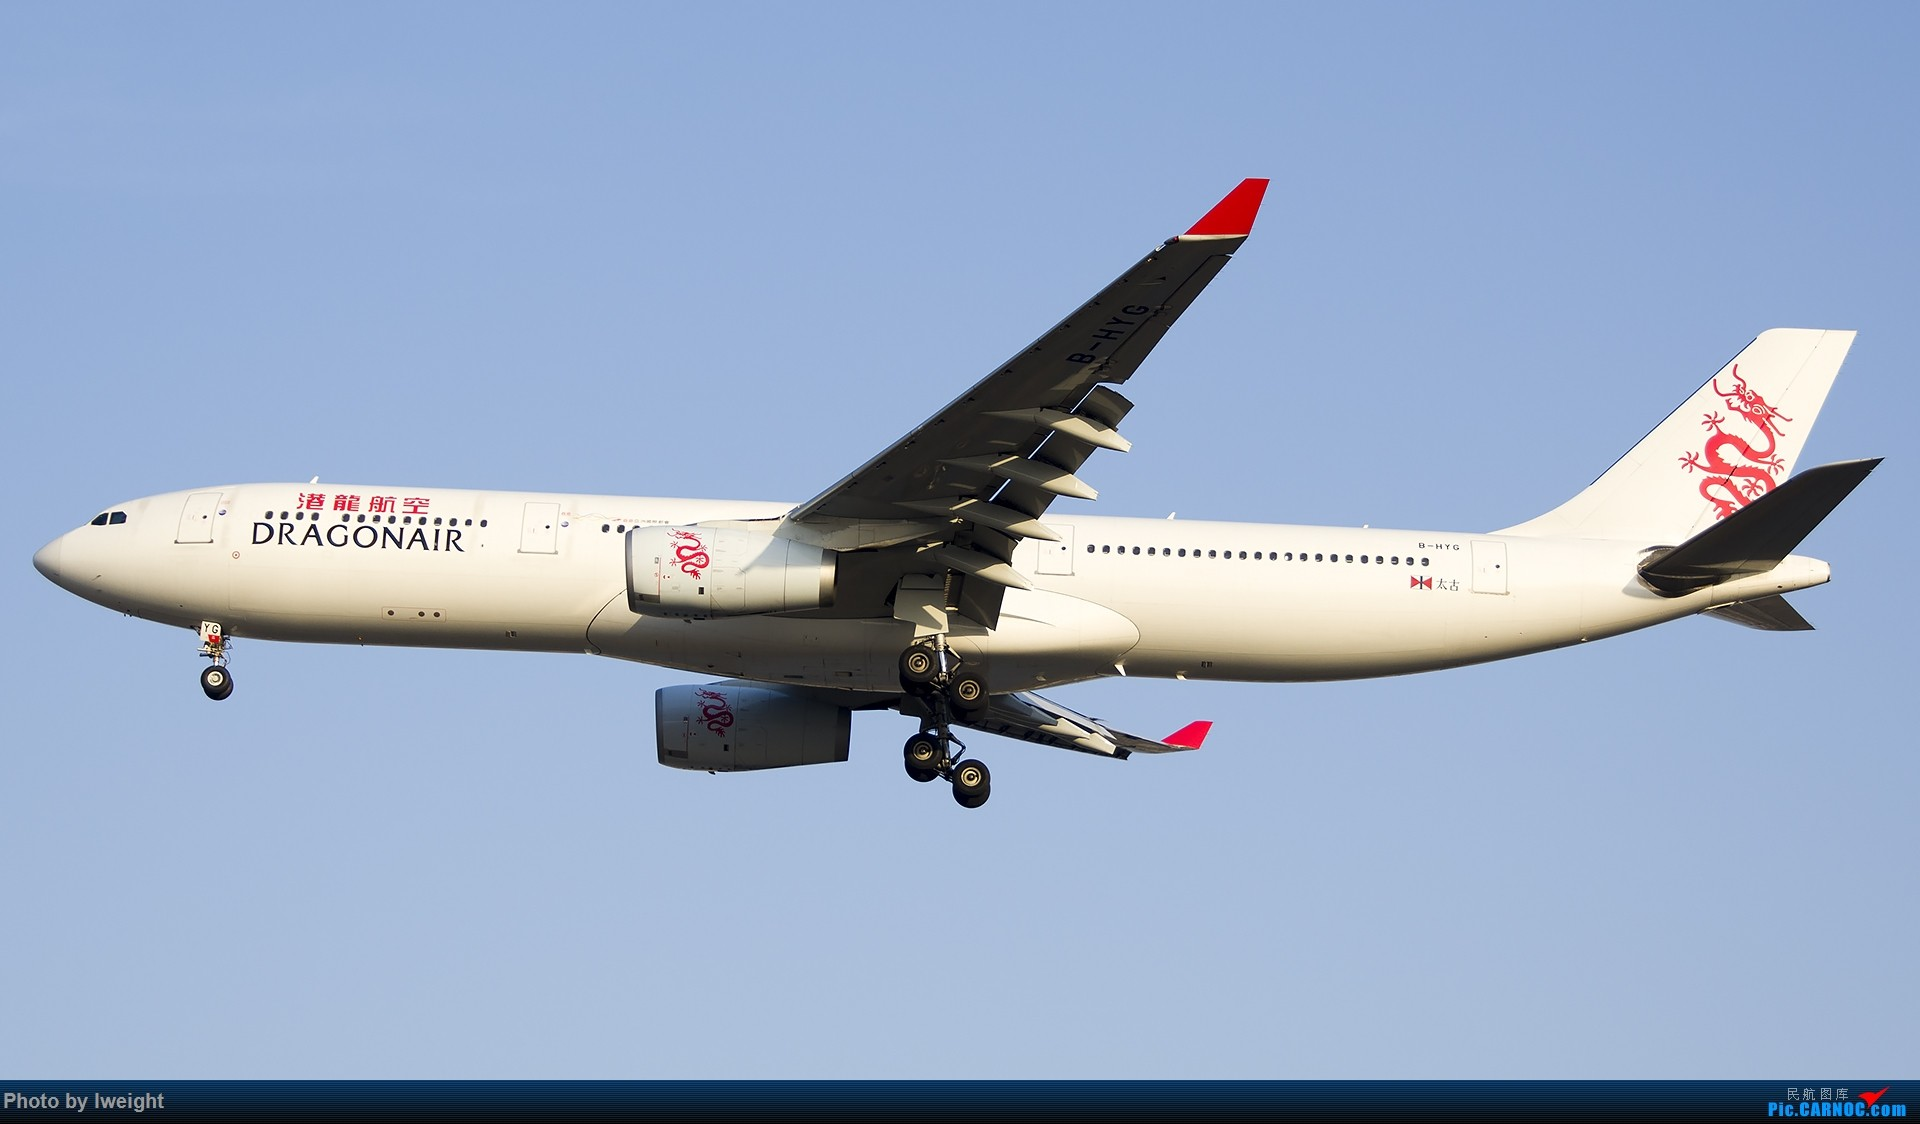 Re:[原创]庆祝升级777,发上今天在首都机场拍的所有飞机【2014-12-14】 AIRBUS A330-300 B-HYG 中国北京首都国际机场